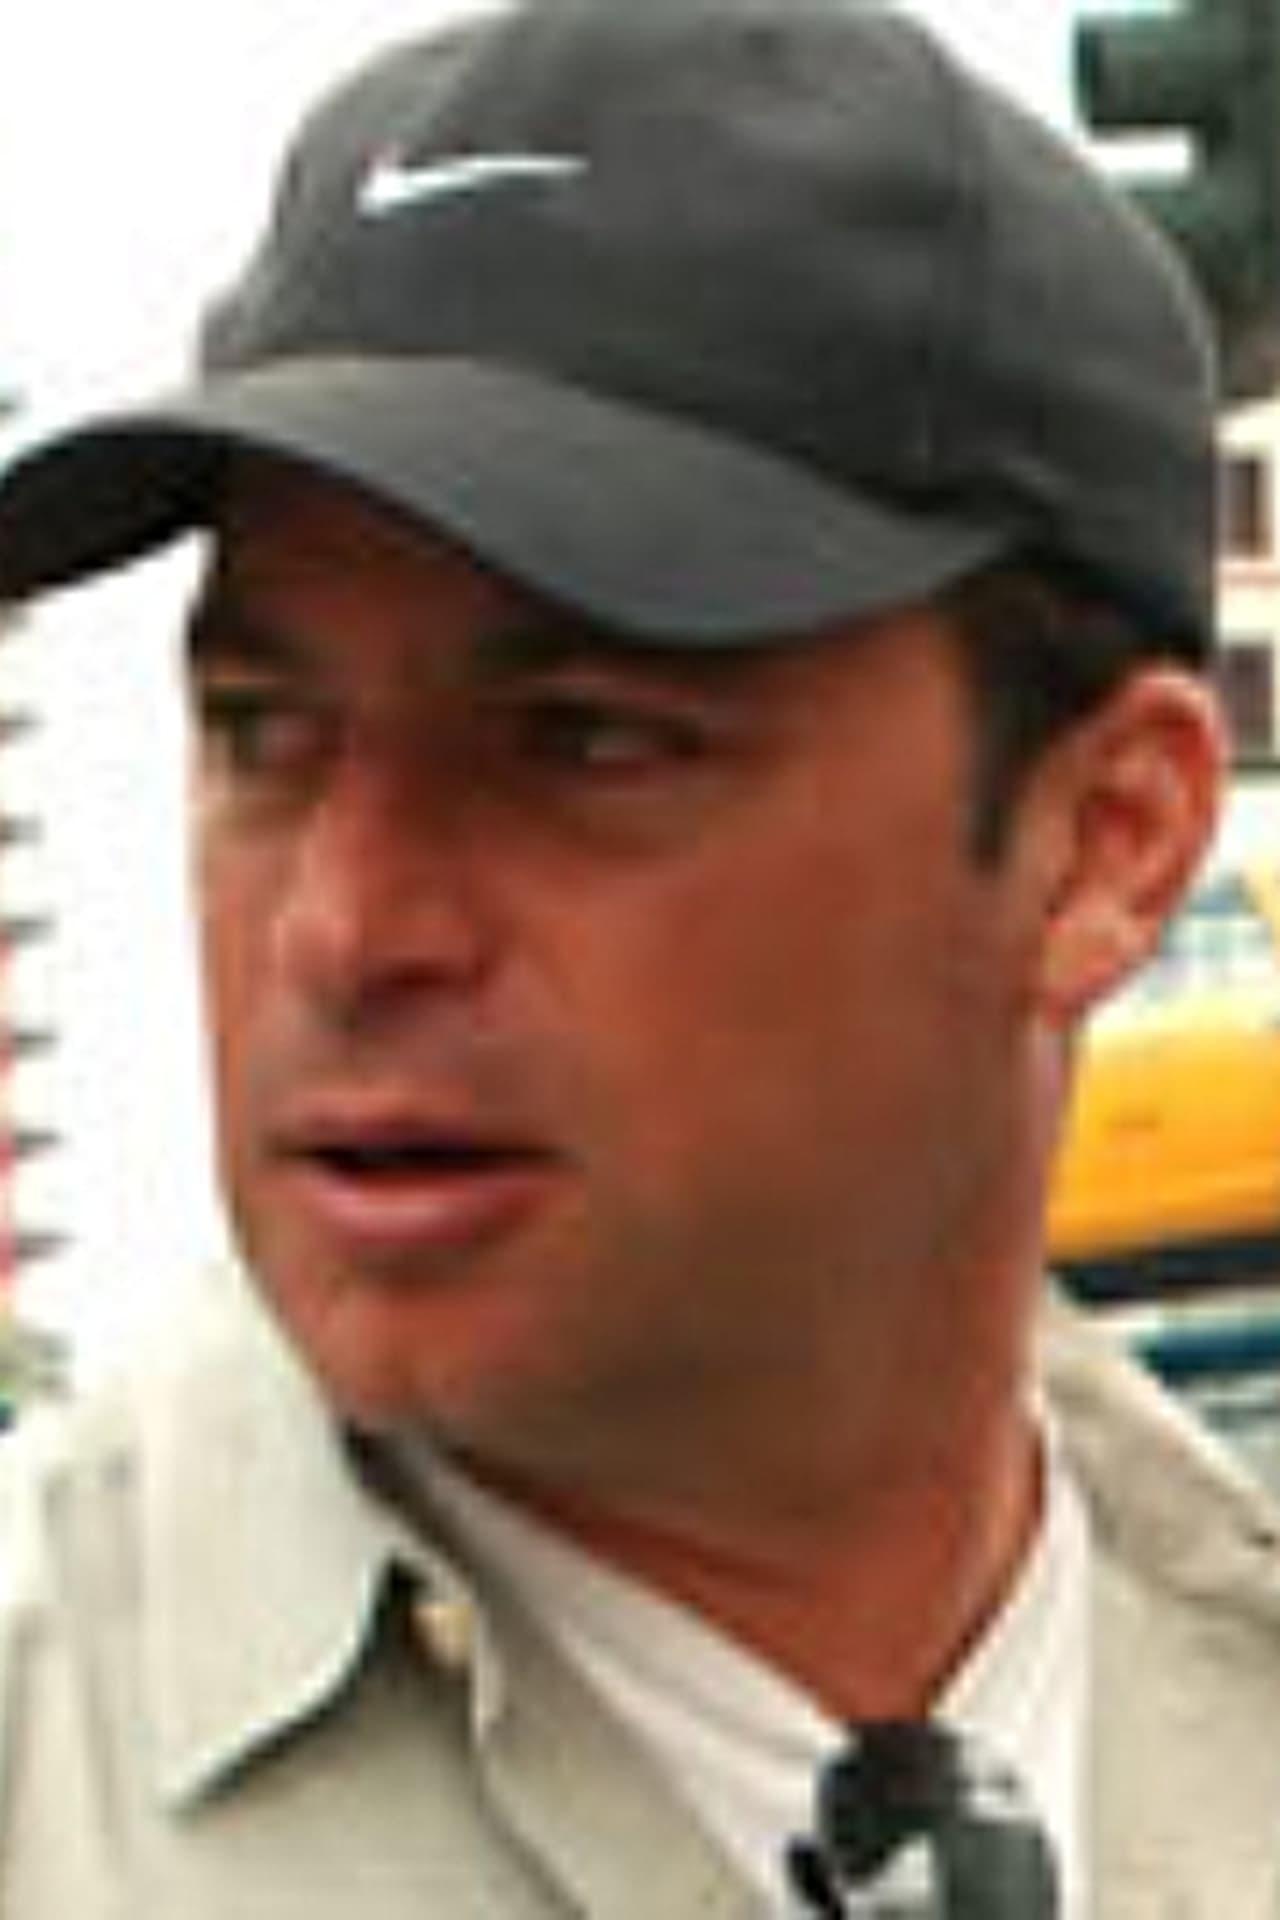 Paul Abascal